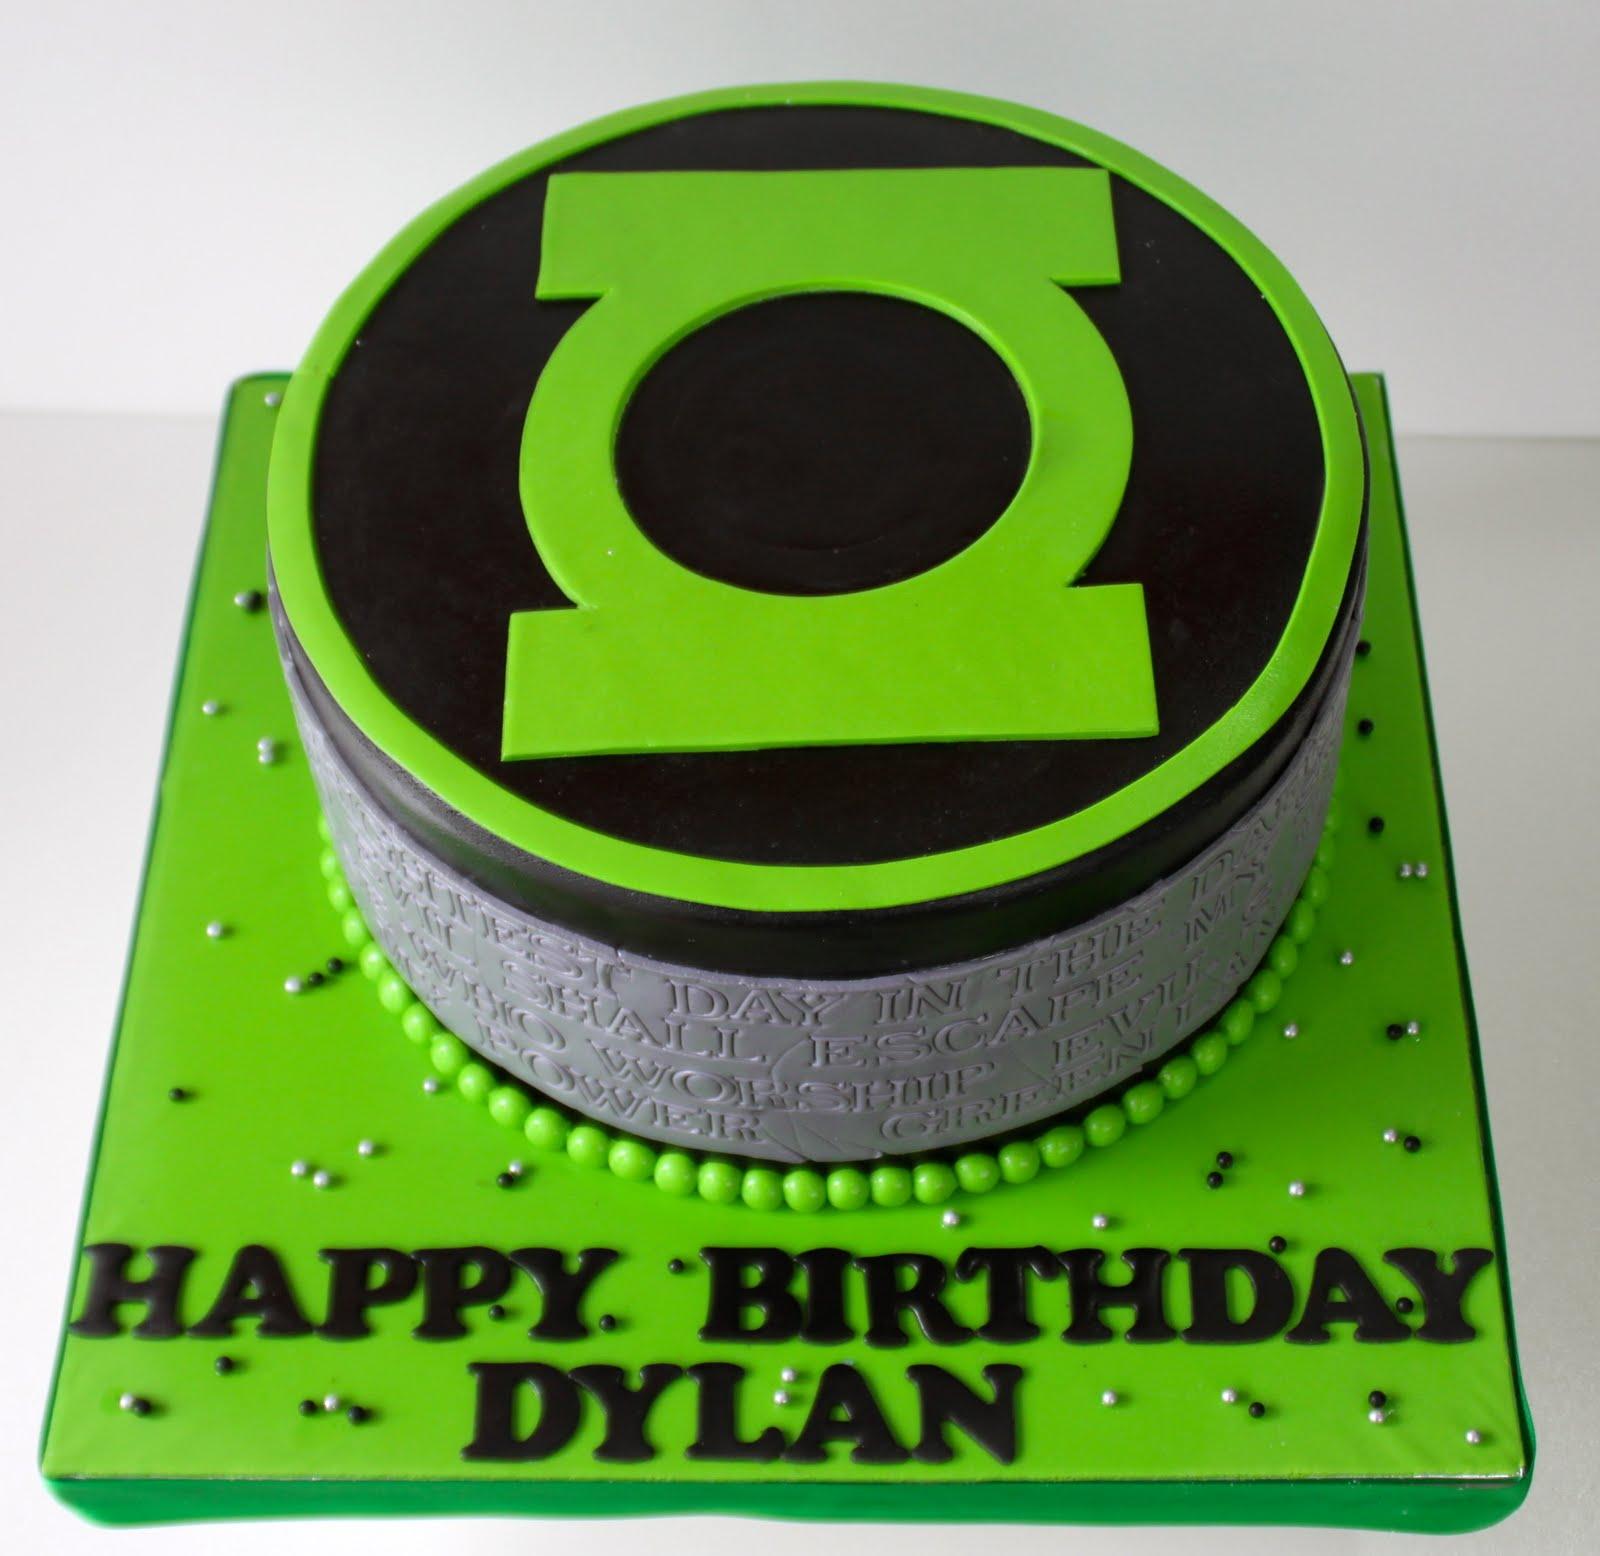 Celebrate with Cake!: Green Lantern Cake